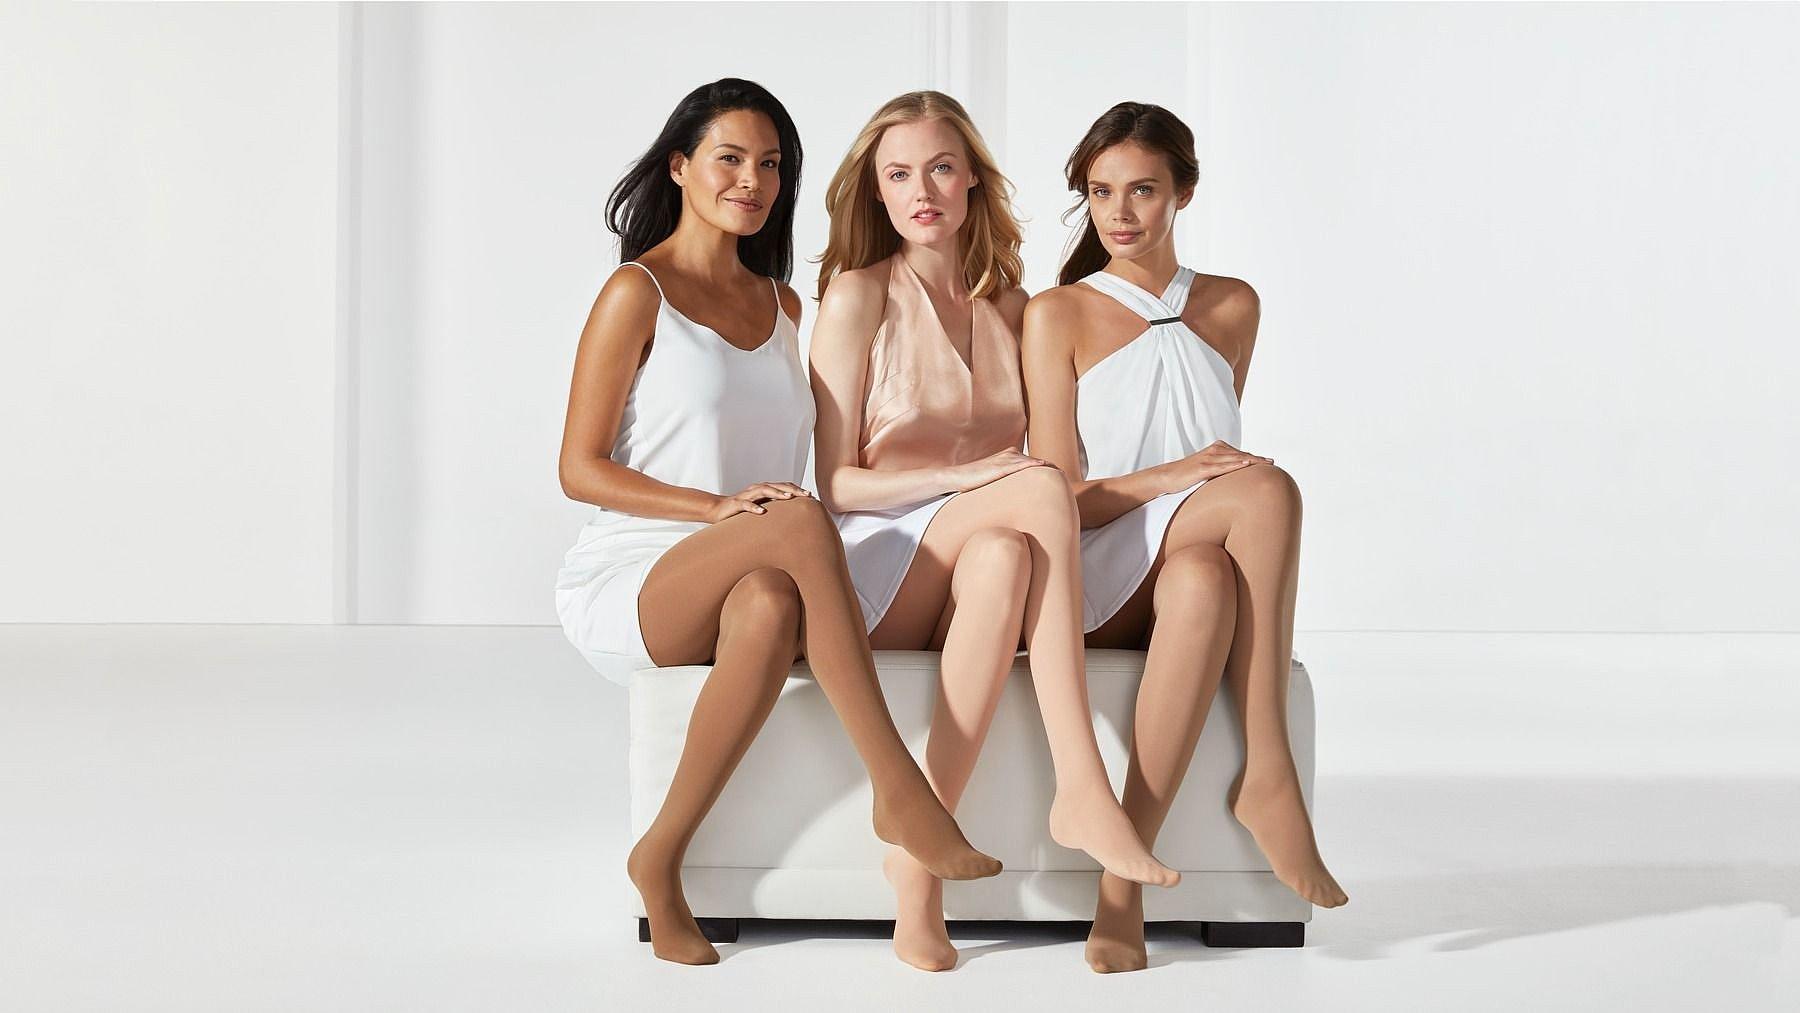 mediven elegance compression stockings from medi